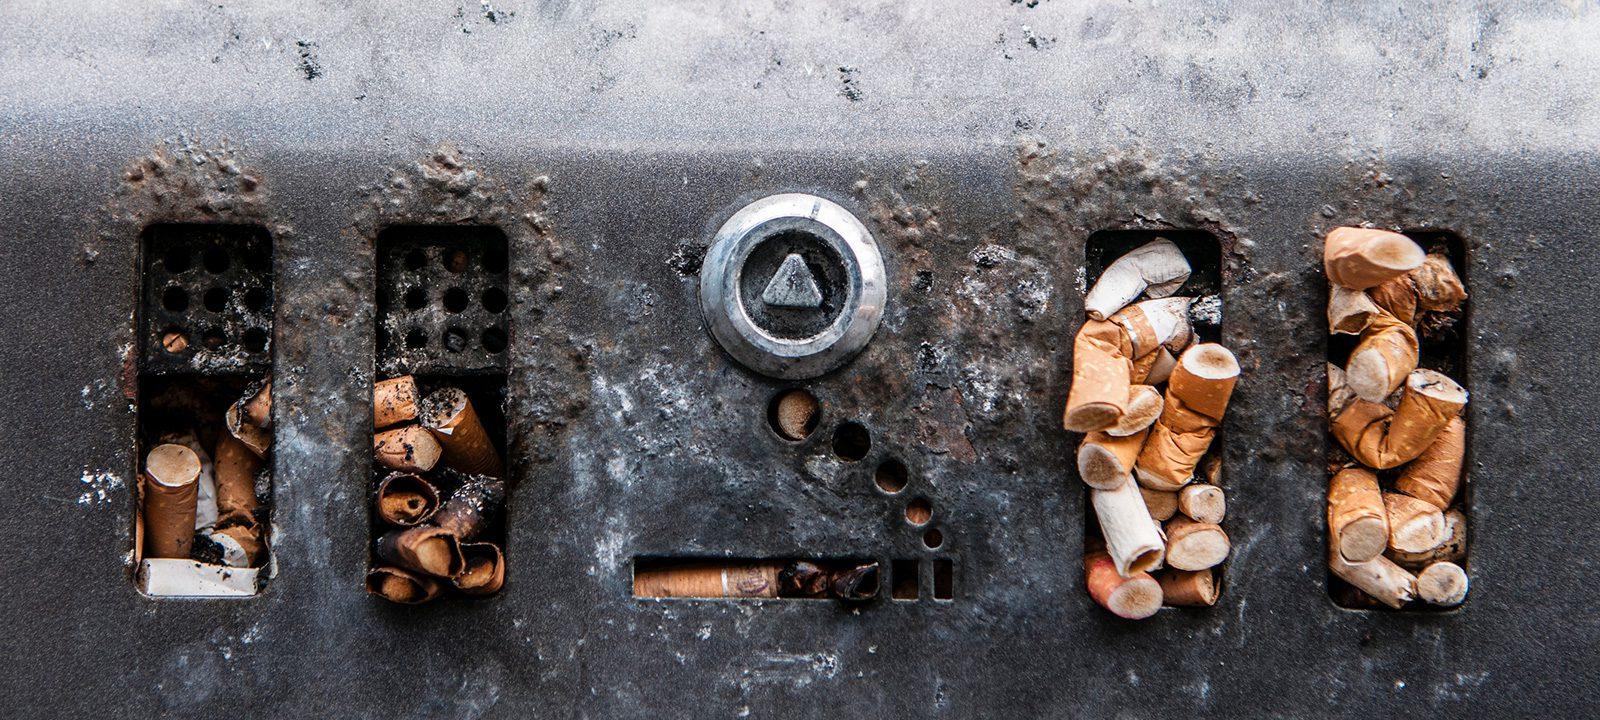 Carbon monoxide testing in smoking cessation